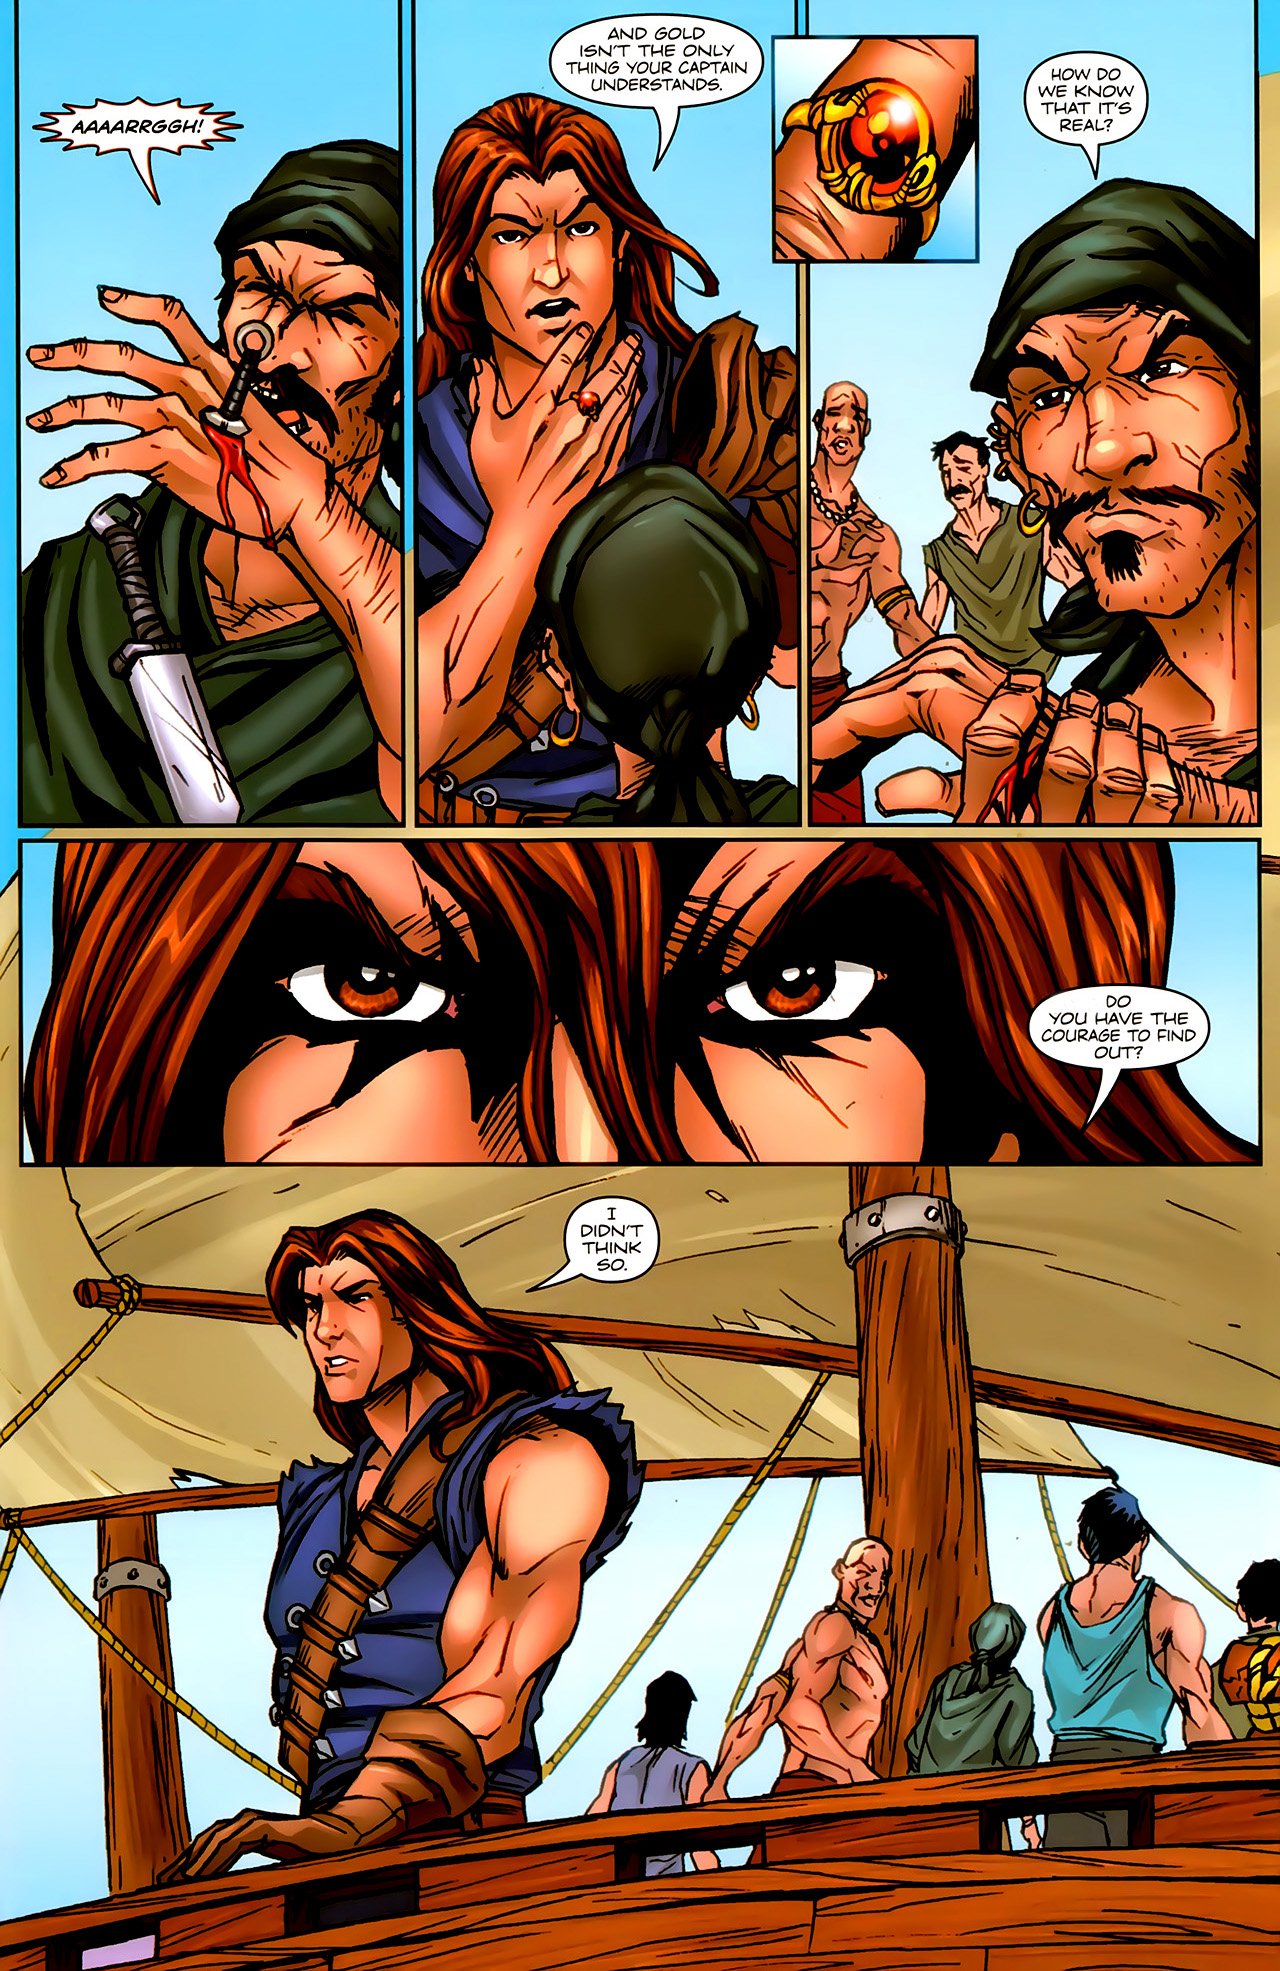 Read online 1001 Arabian Nights: The Adventures of Sinbad comic -  Issue #9 - 11